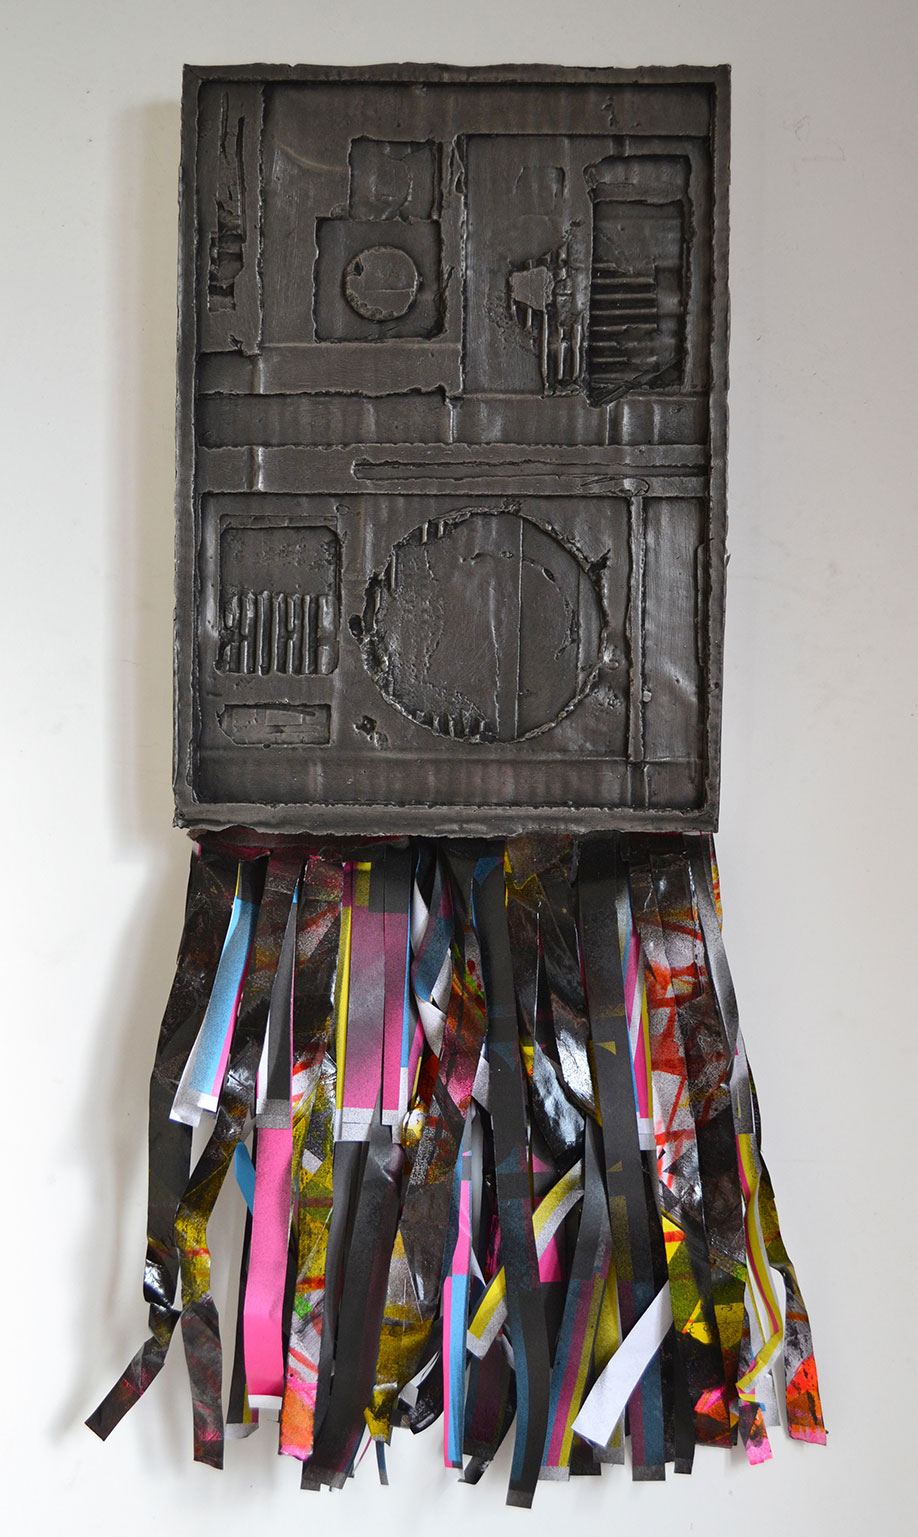 <b>Title:</b>Jodie Foster's Army<br /><b>Year:</b>2013<br /><b>Medium:</b>Plaster of Paris, grate polish, spray paint, paper<br /><b>Size:</b>72 x 31 cm